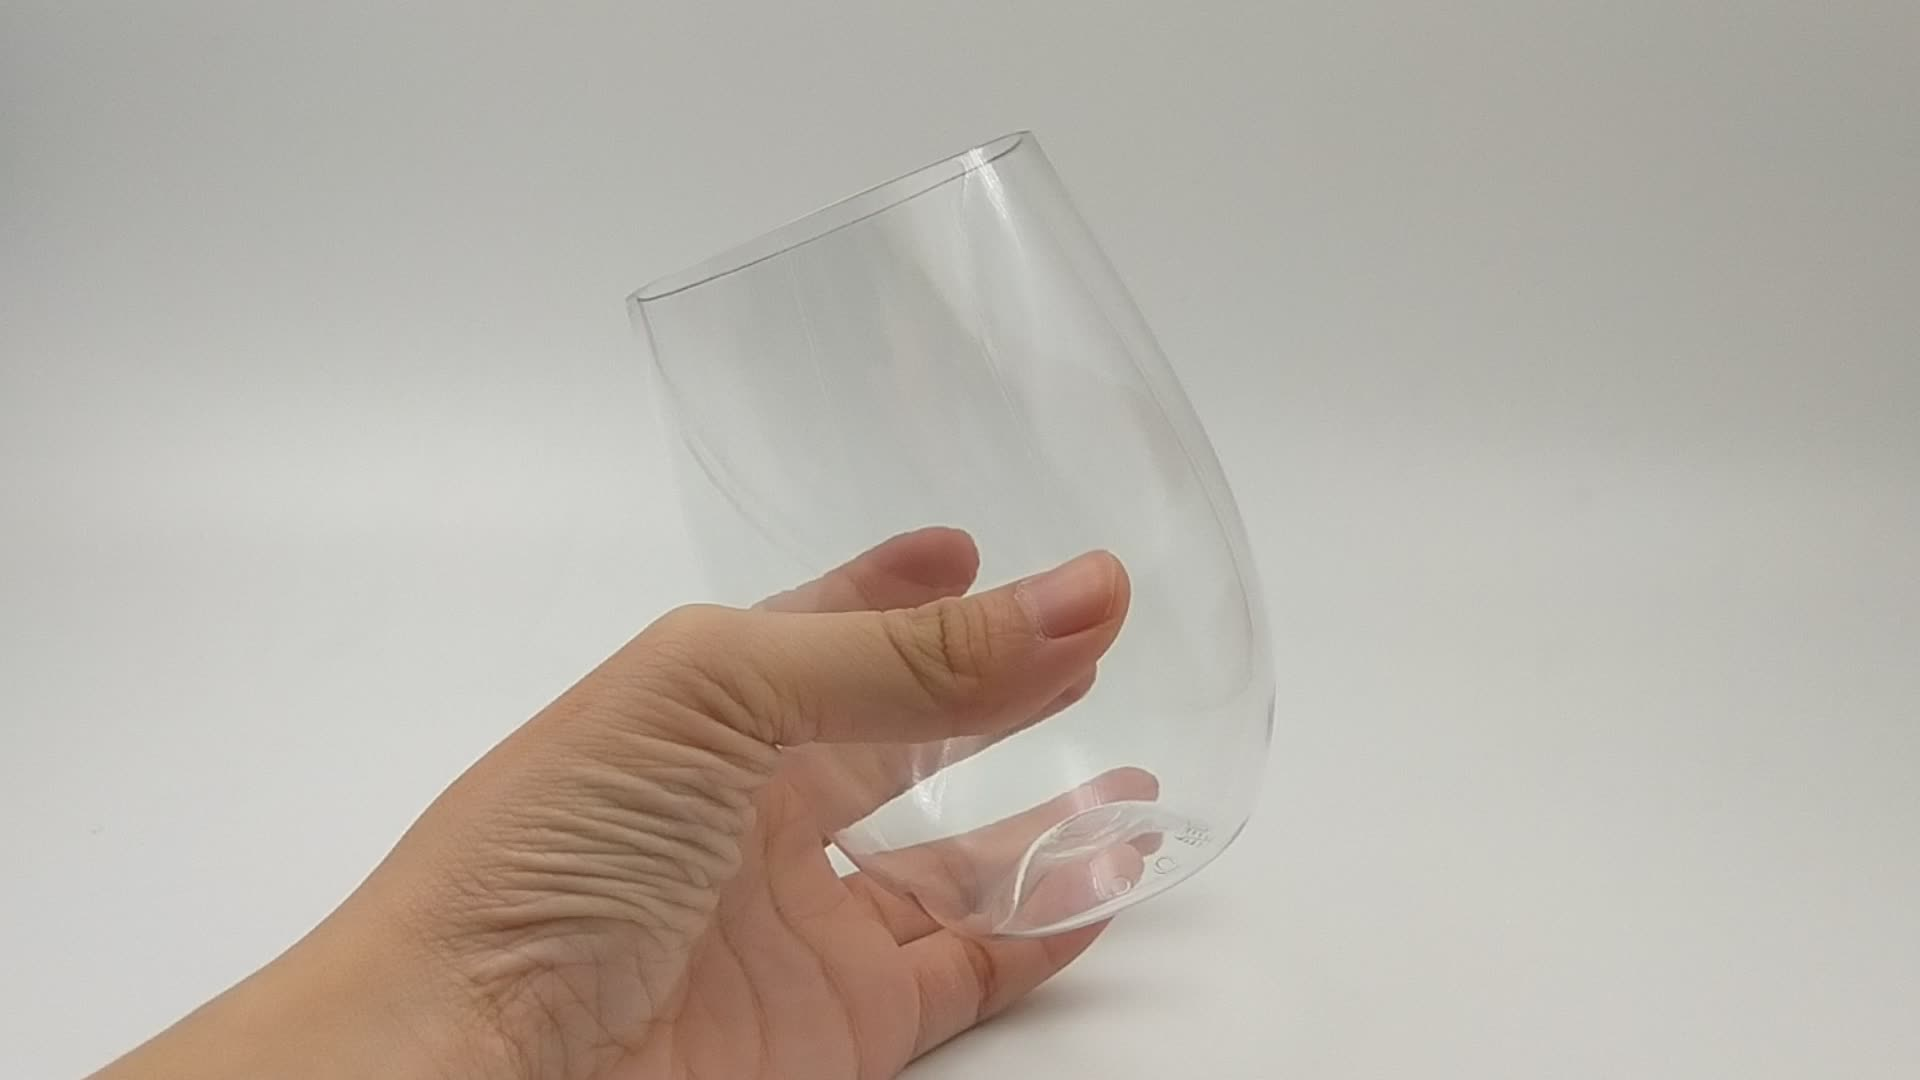 Wholesale Cheap 16oz Stemless Disposable Mugs Plastic Wine Glass with Tritan Dishwashing Safe